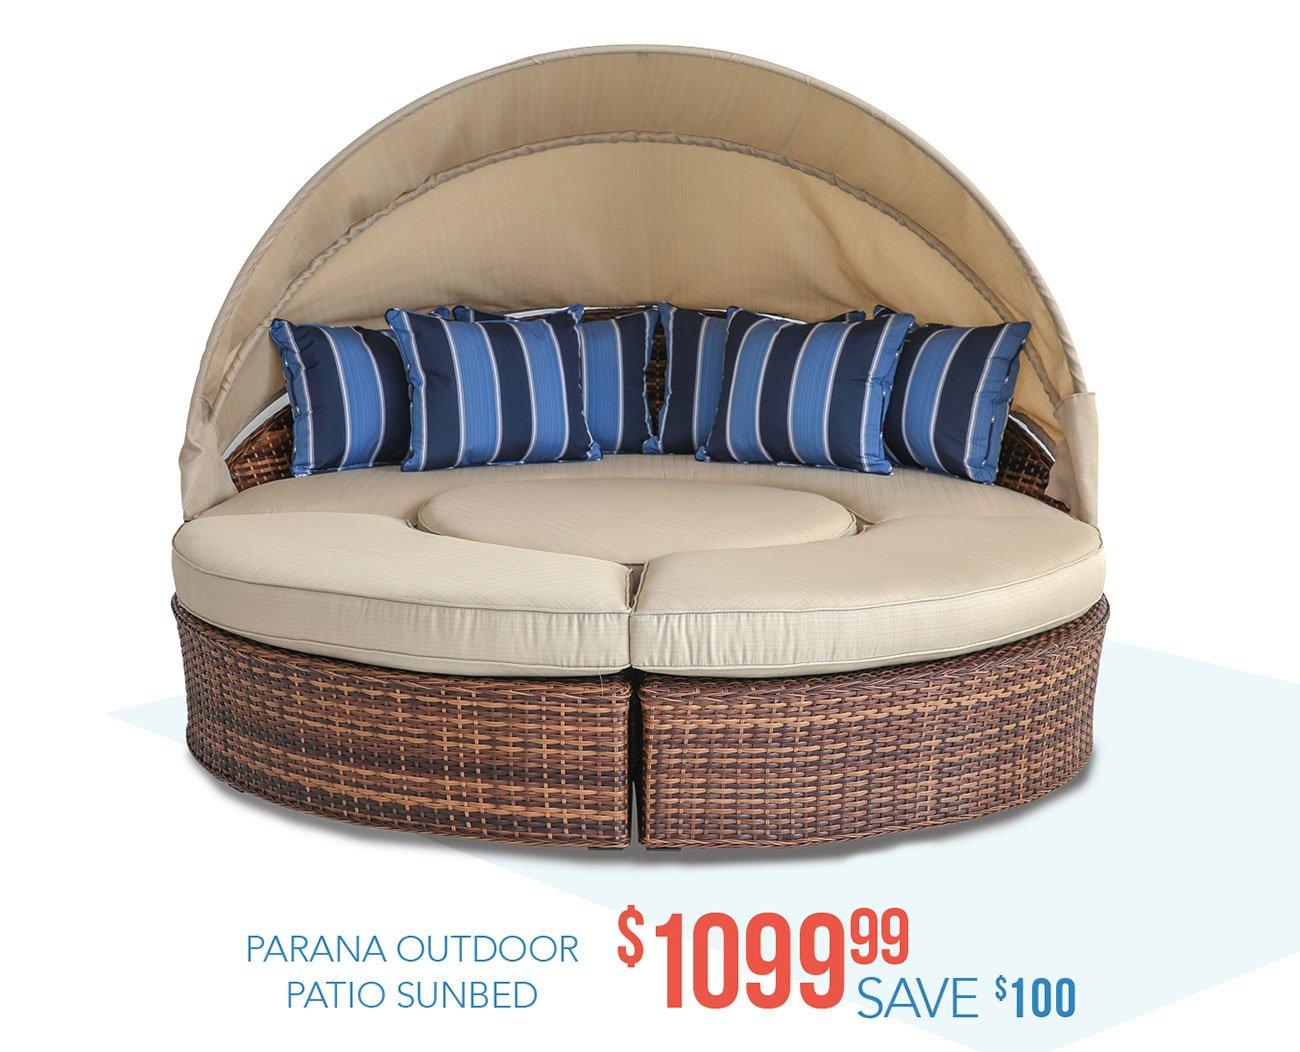 Parana-outdoor-patio-sunbed